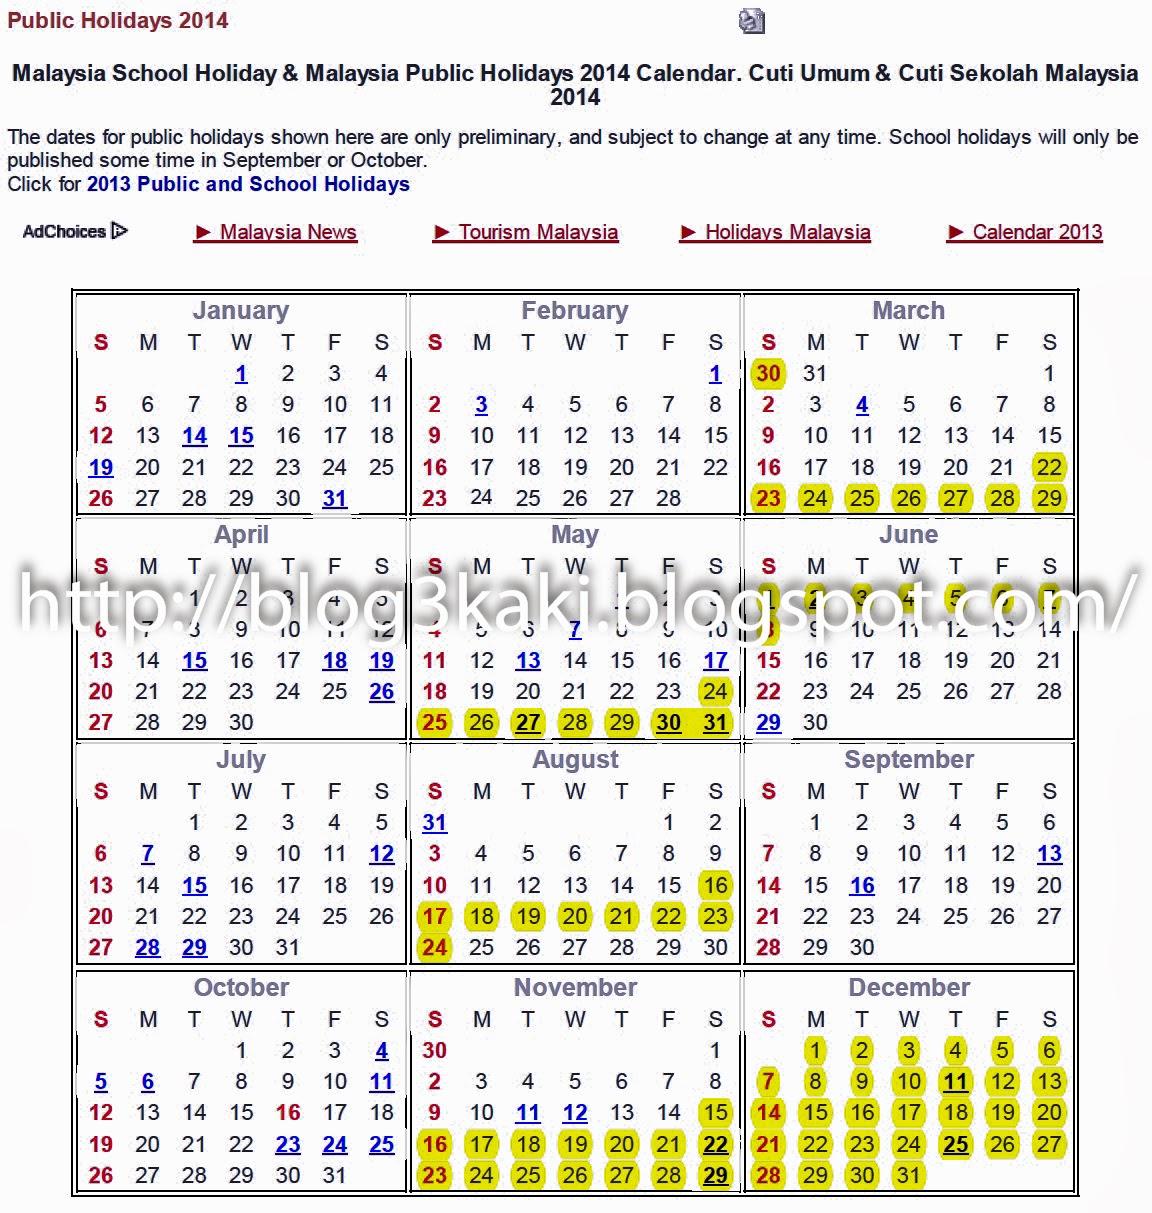 http://3.bp.blogspot.com/-ARic01To8MM/UlKM_jOeLXI/AAAAAAAADJo/HQGZkNuxFIs/s1600/Malaysia+Public+Holidays+&+School+Holidays+2014+-+One+Stop+Malaysia.jpg